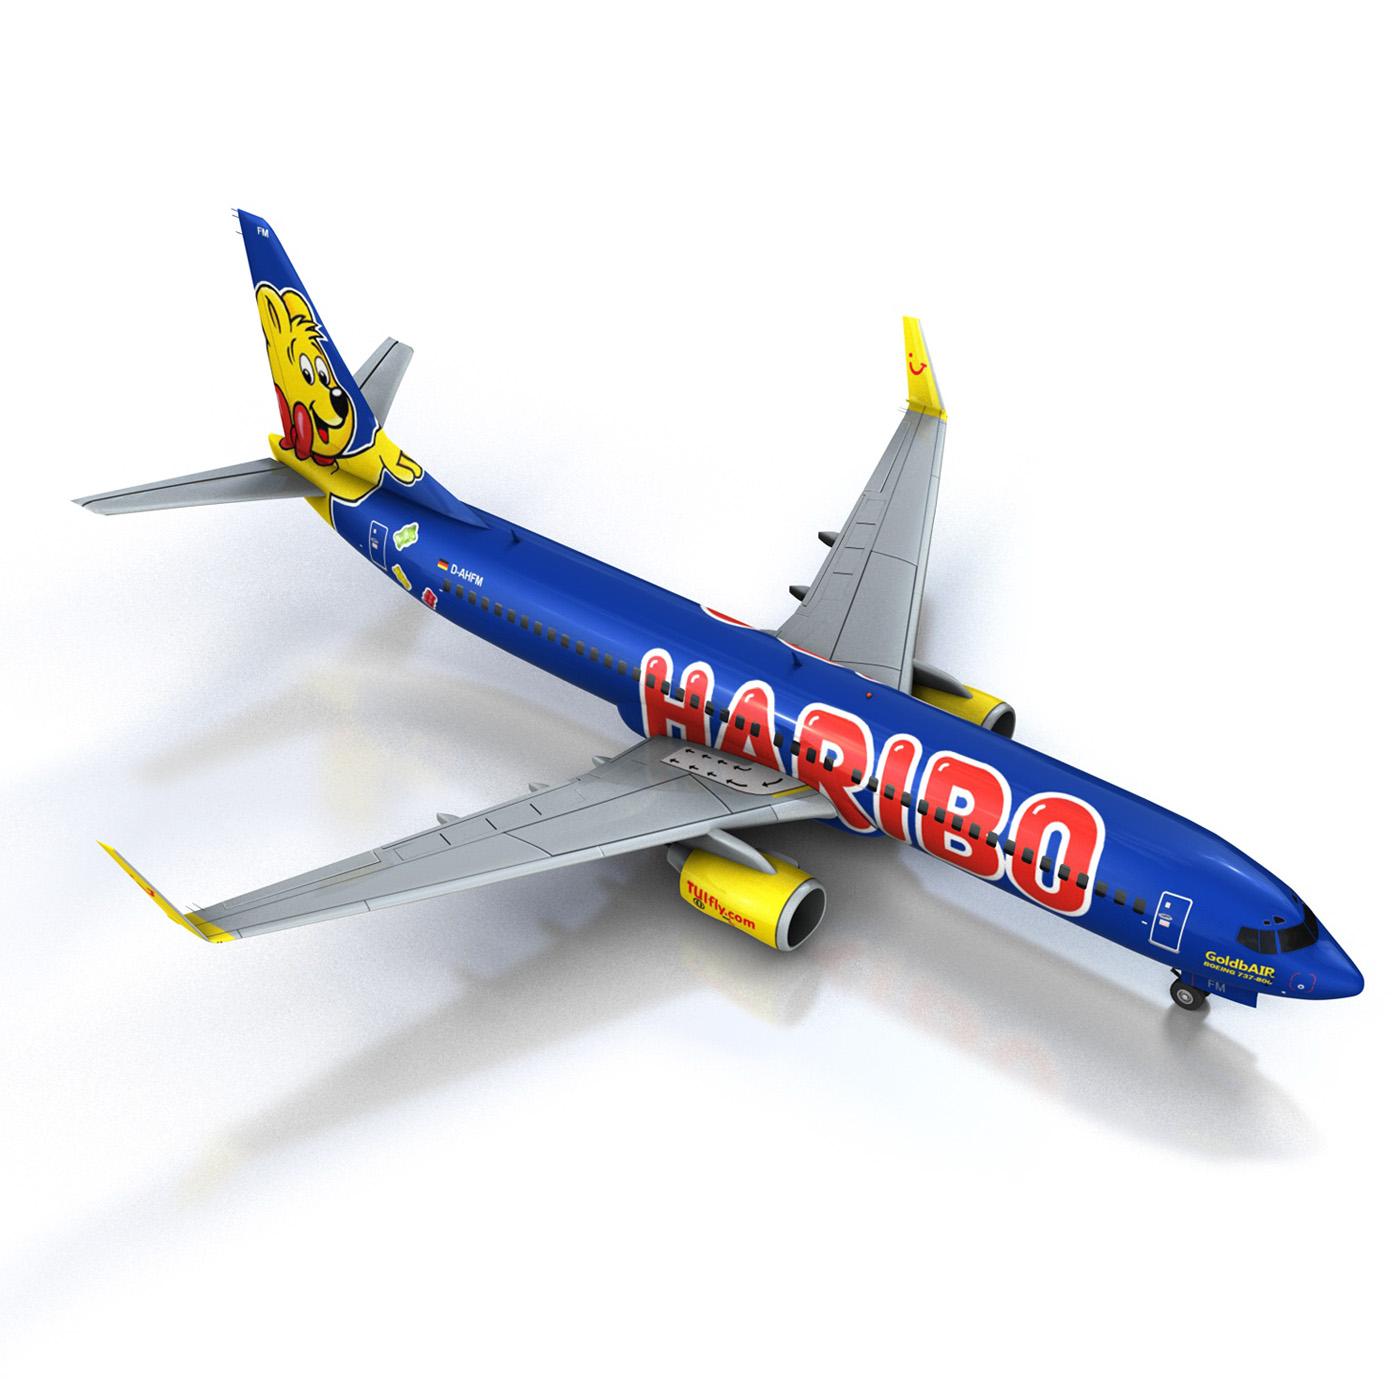 boeing 737-800 goldbair 3d model 3ds fbx c4d lwo obj 293498